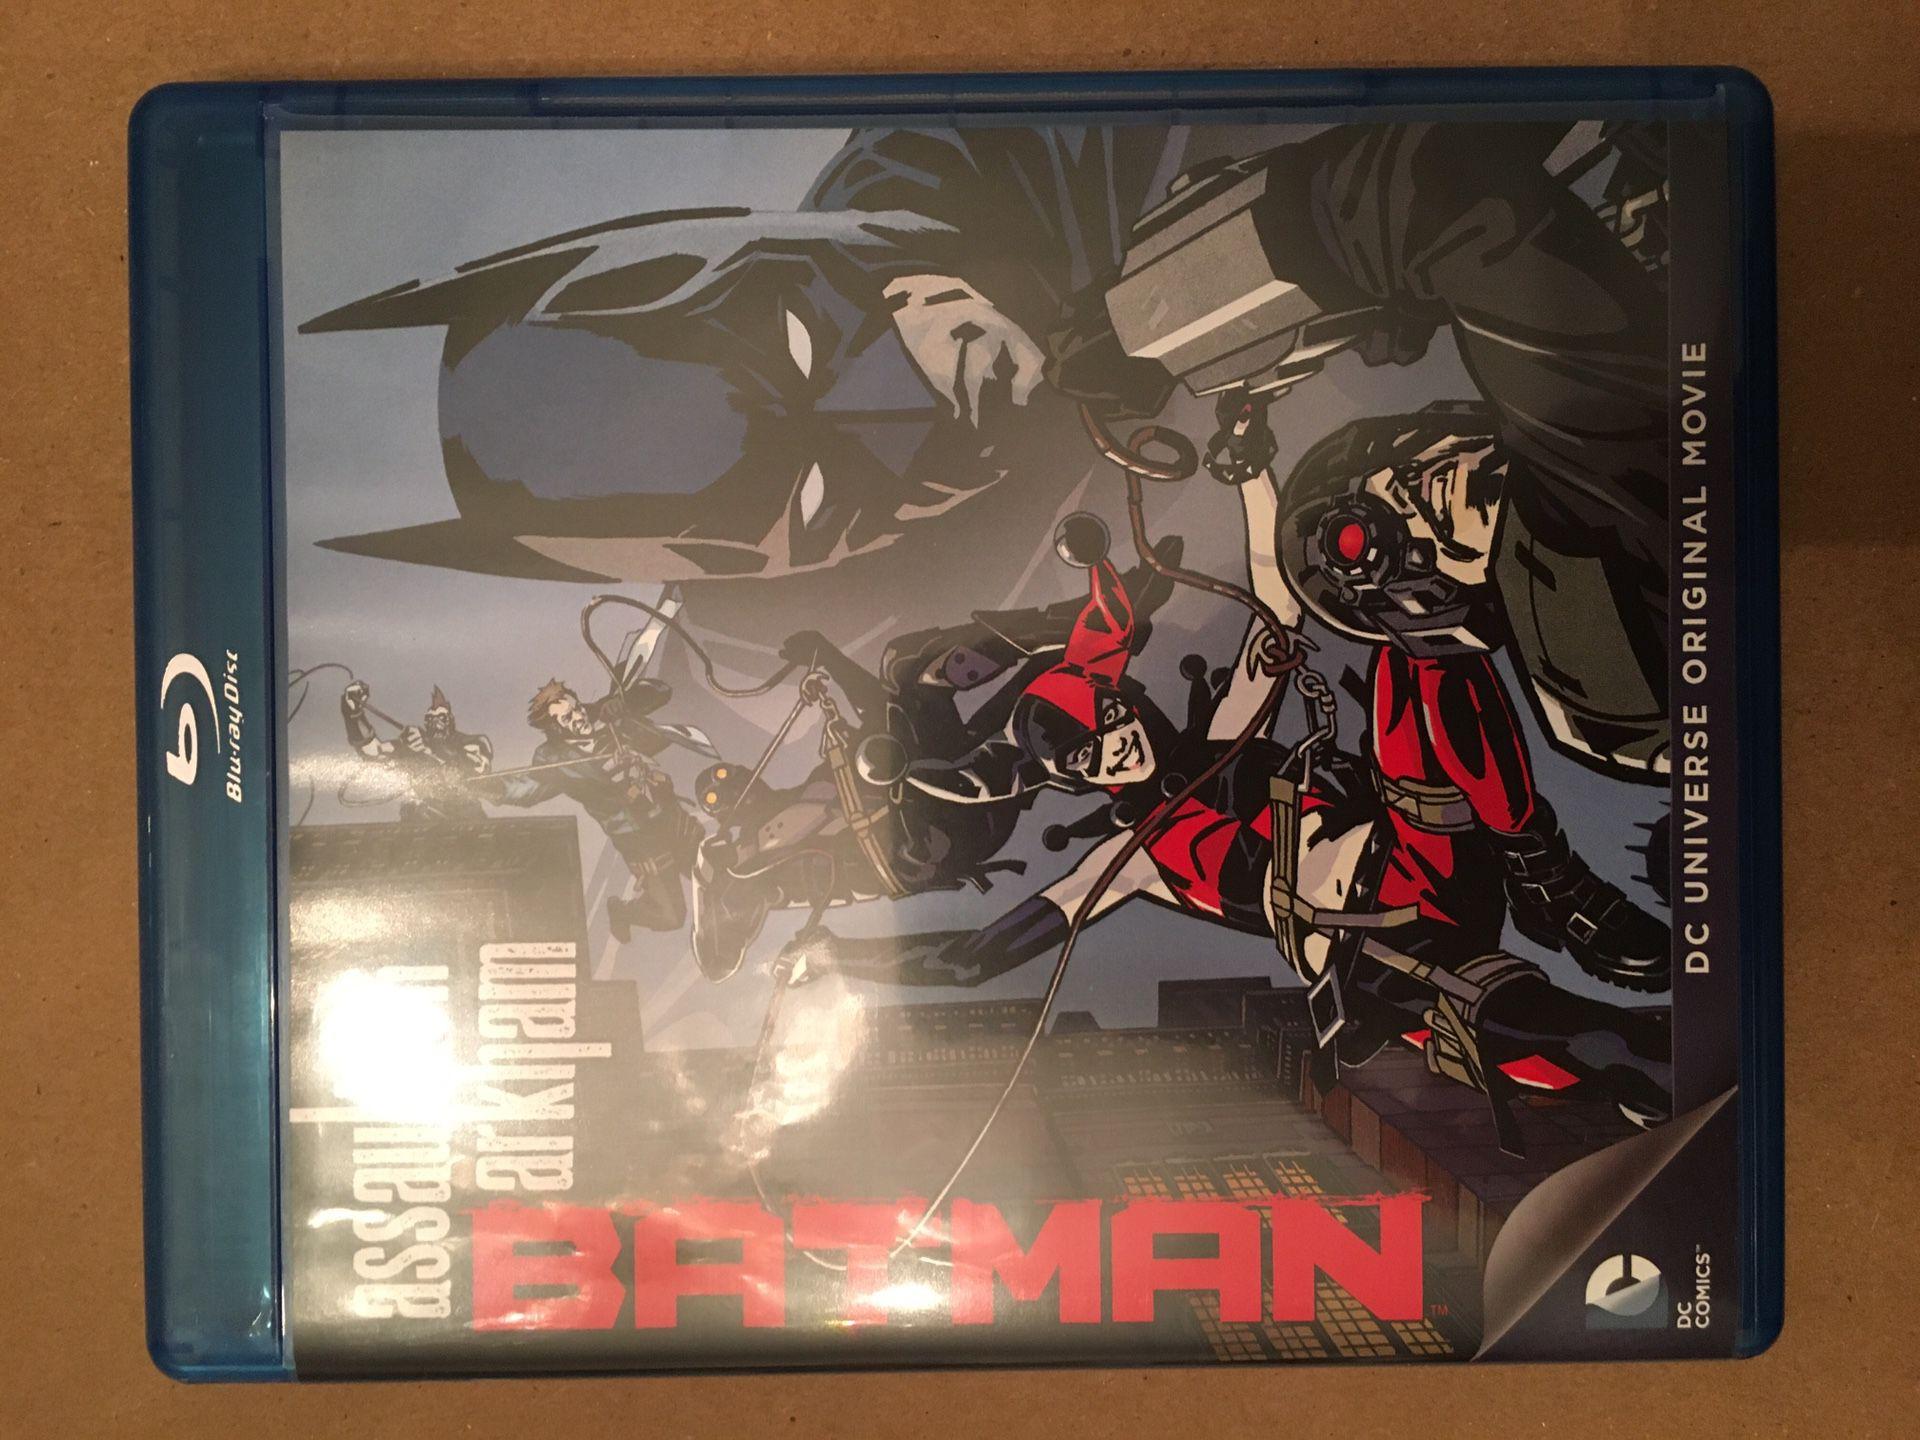 Batman: Assault on Arkham Blue Ray & DVD animated movie